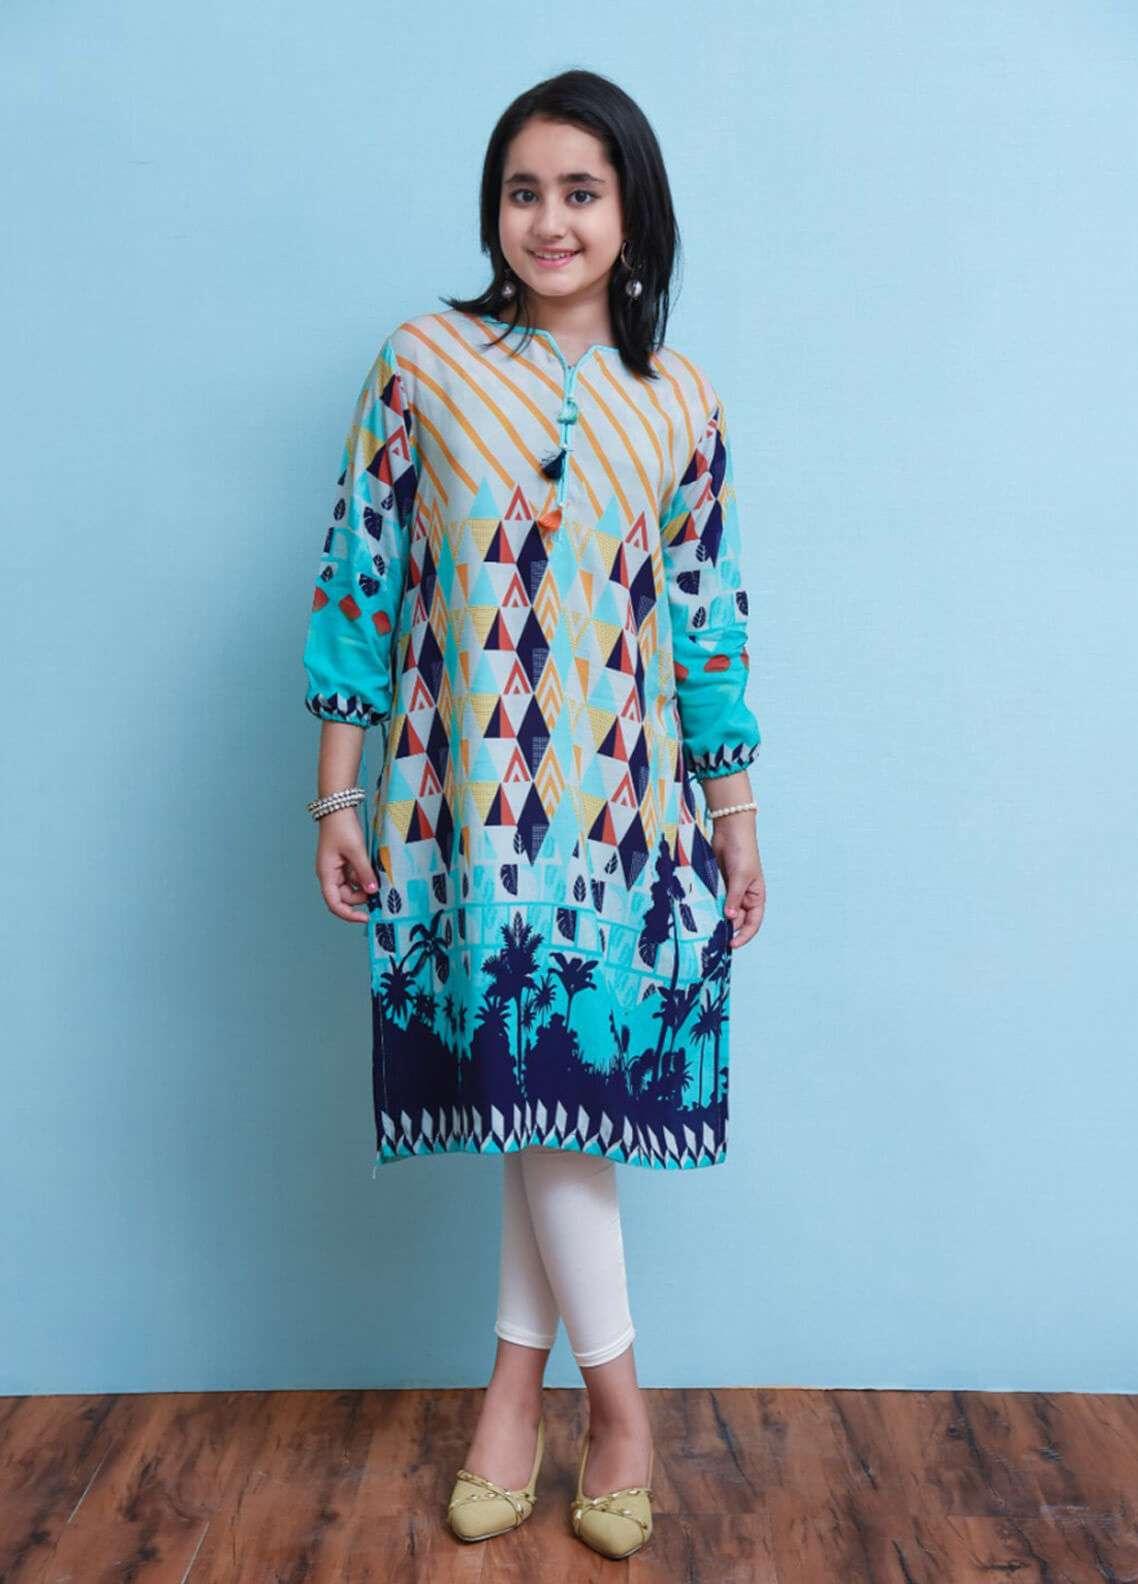 Ochre Cambric Printed Girls Tops - Multi OPL 12